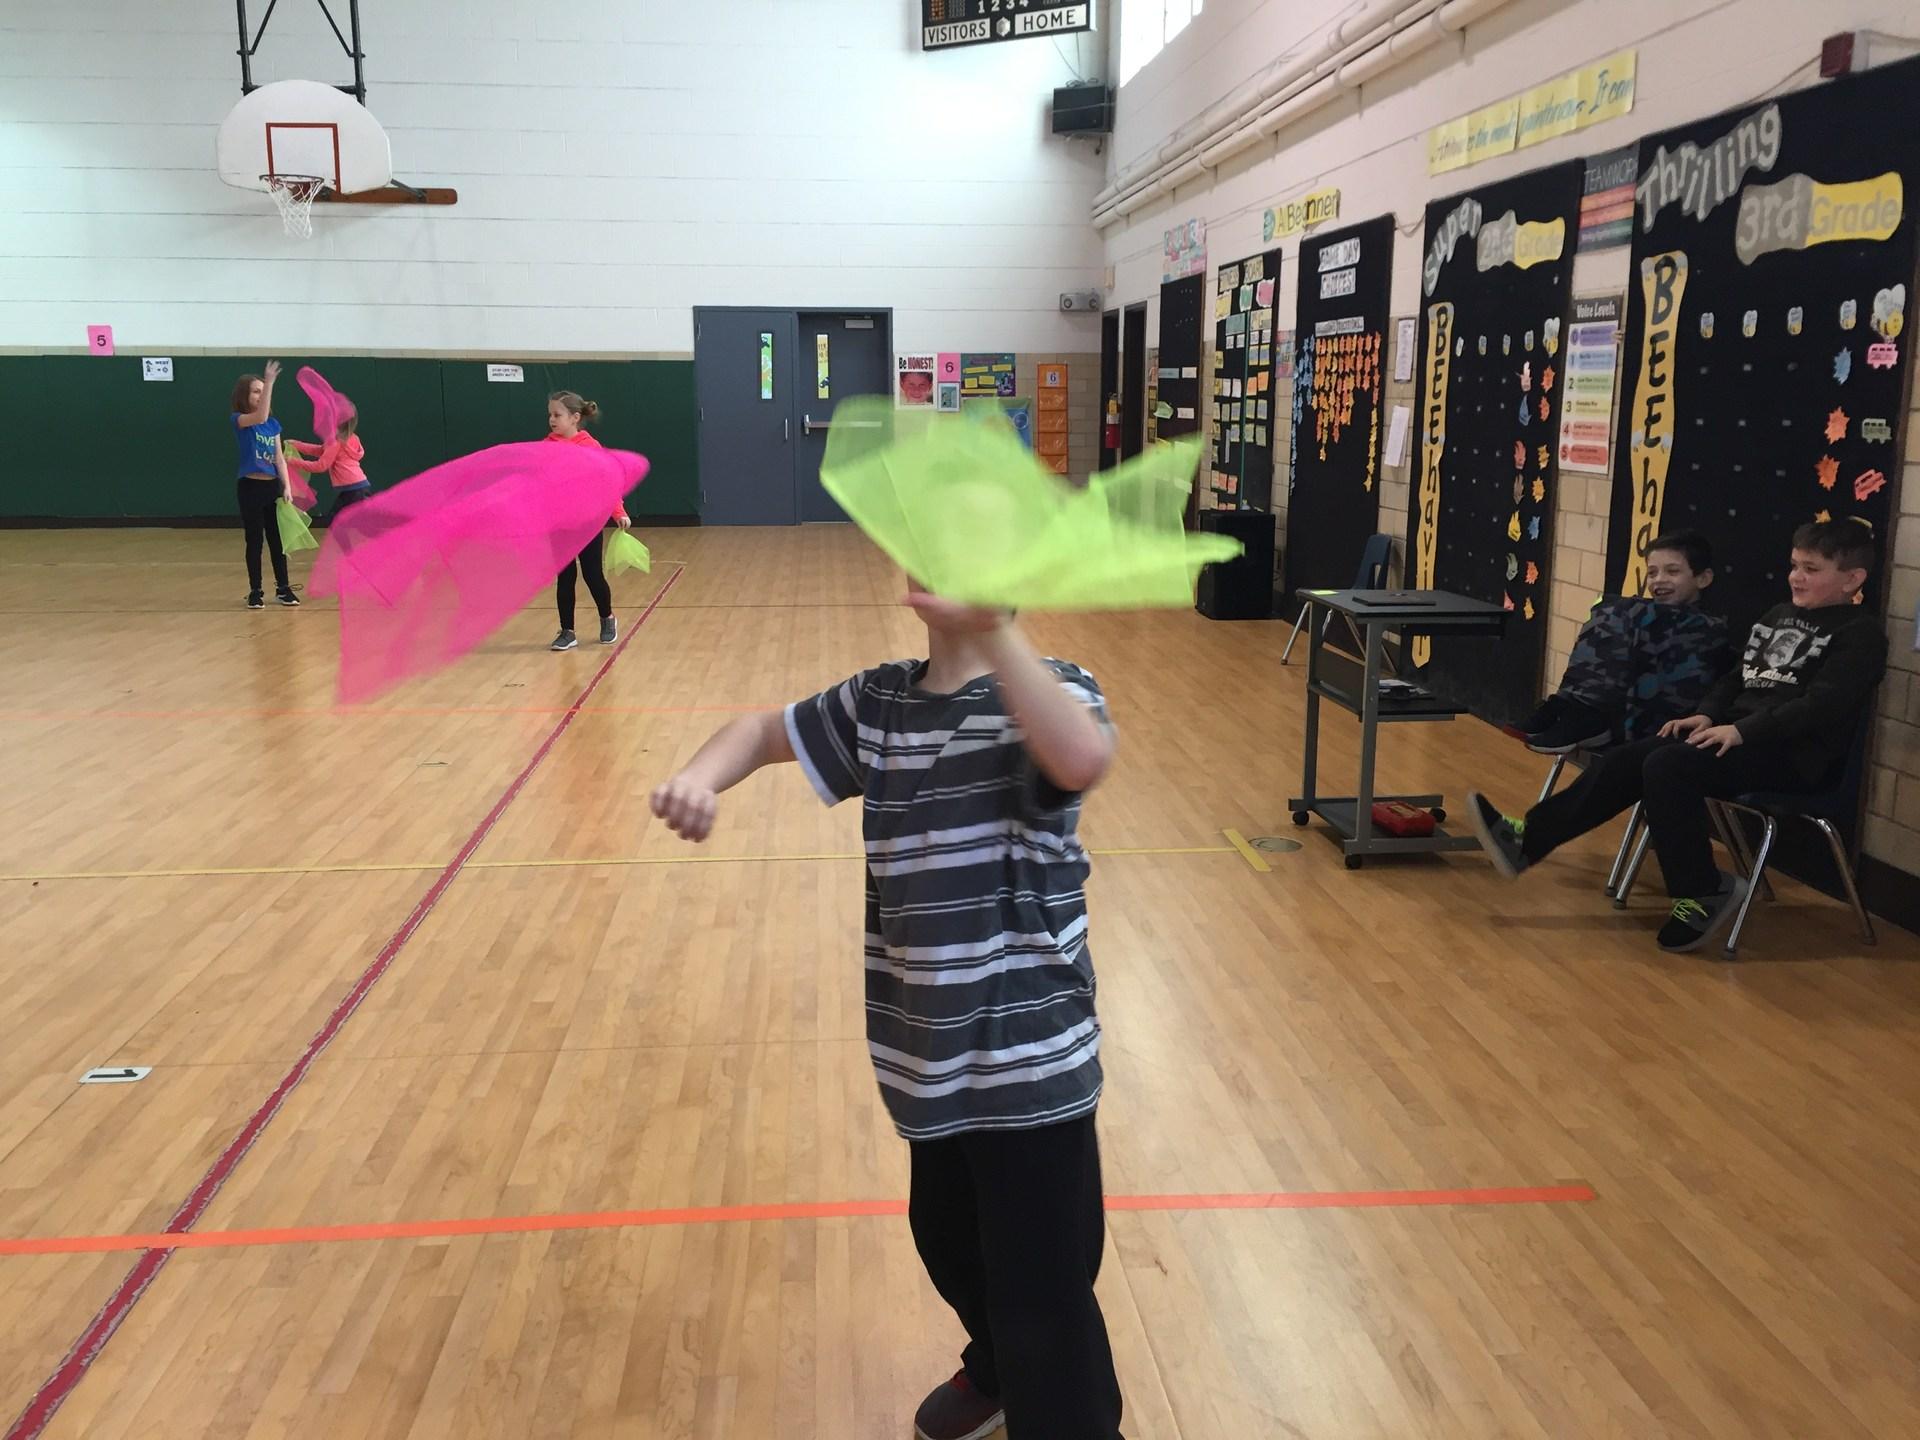 more scarf juggling!